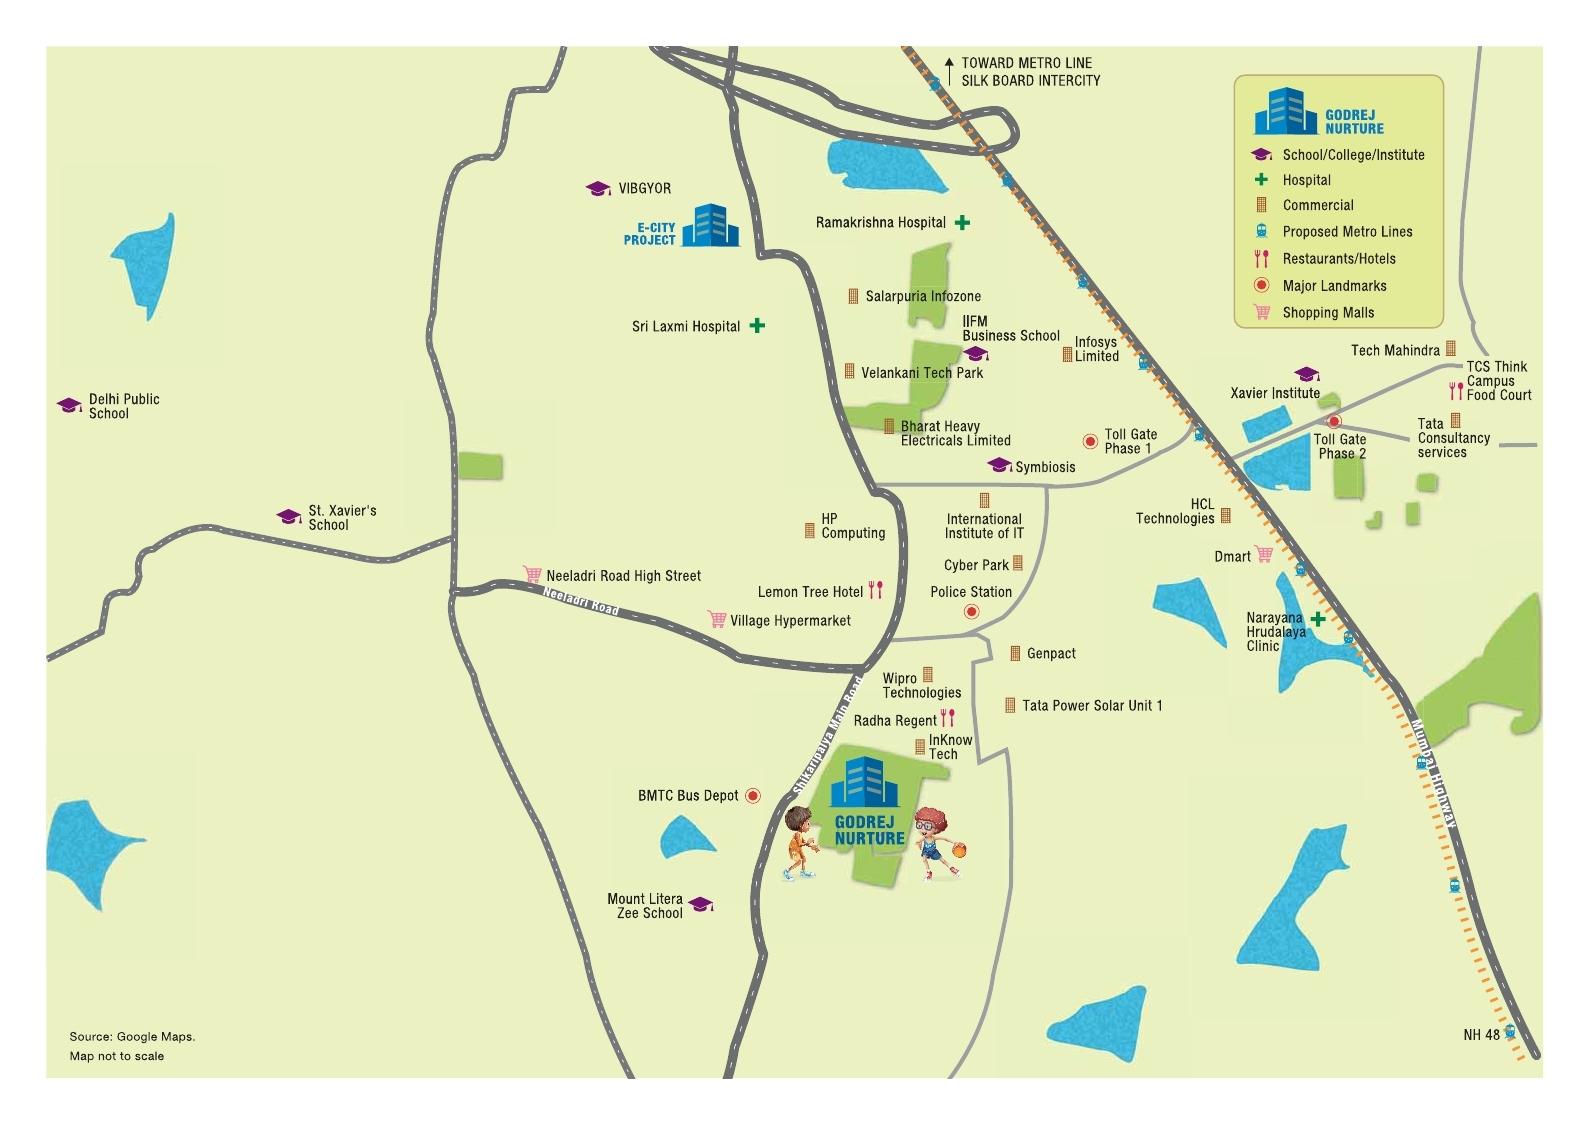 godrej nurture location map